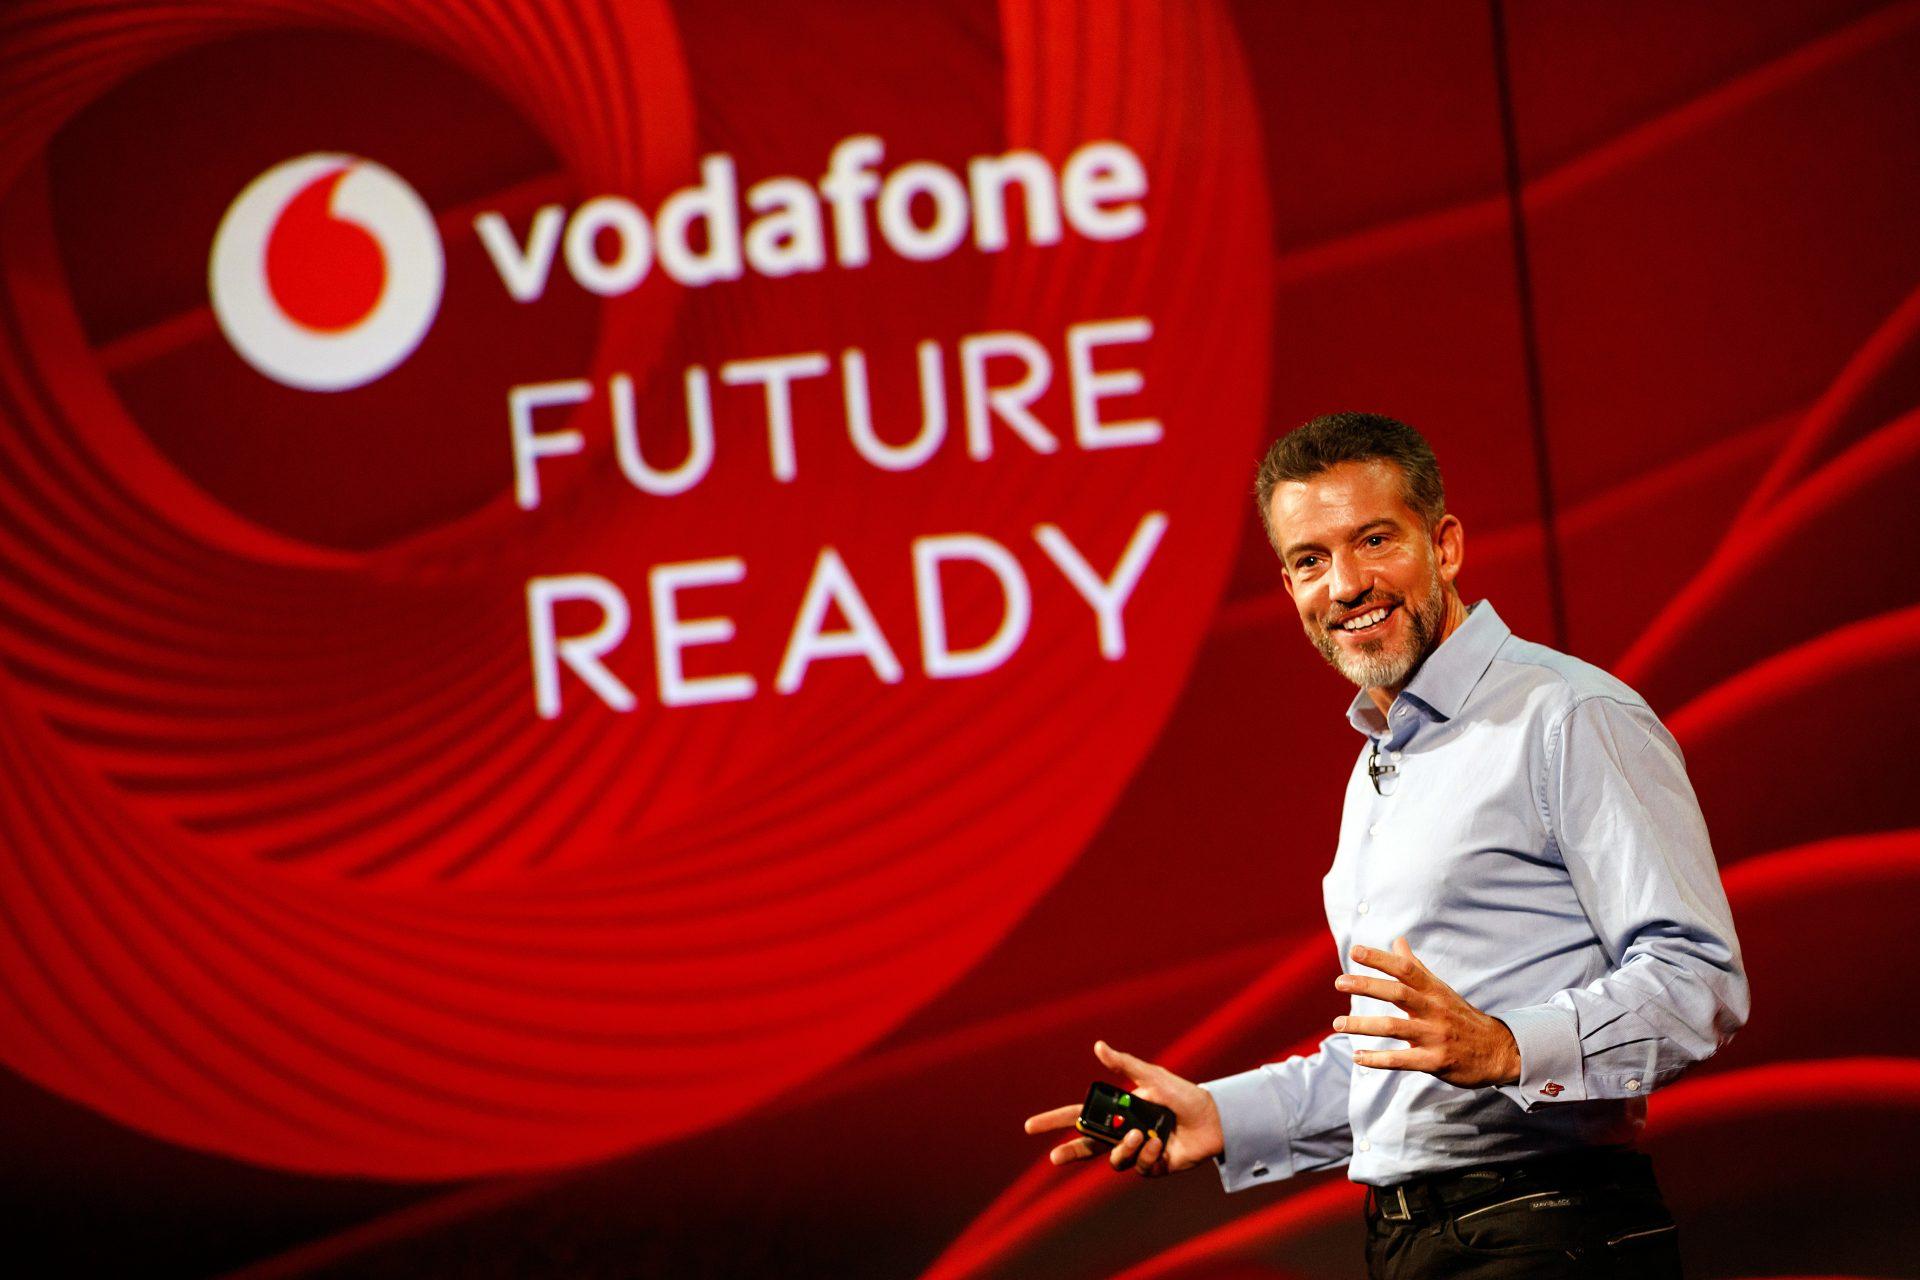 Nick Jeffery, Vodafone CEO speaking at Vodafone Newbury, 20 September 2017